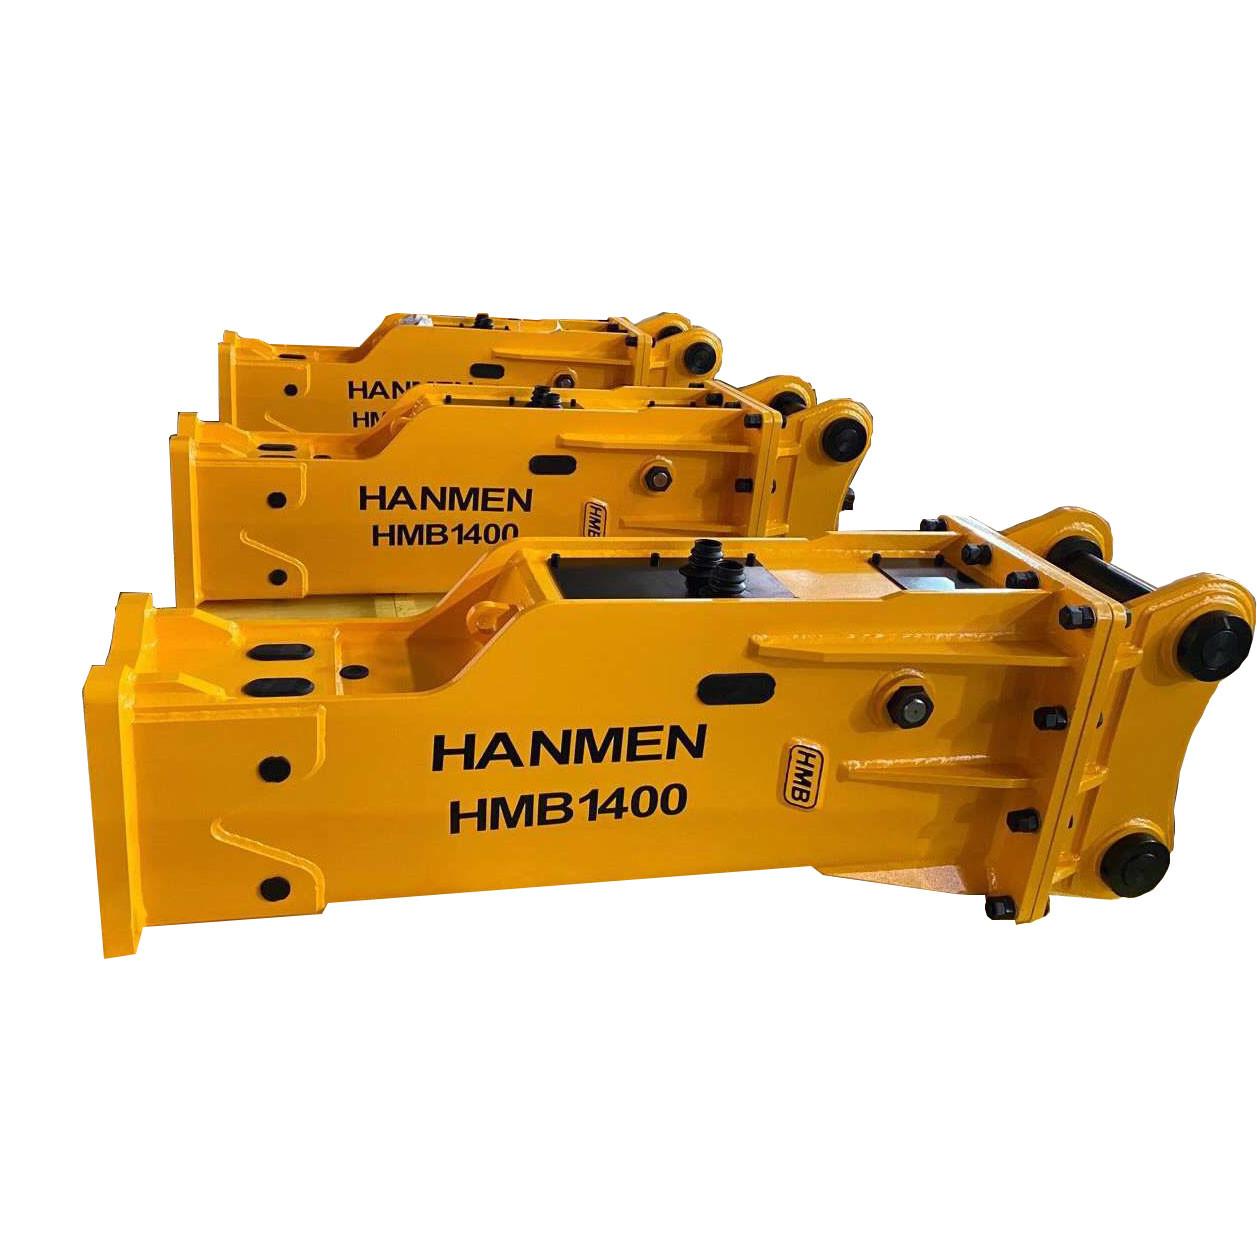 soosan sb81 Concrete Demolition Hydraulic Rock Breaker for 3ton 12ton 18ton 20ton Excavator Digger